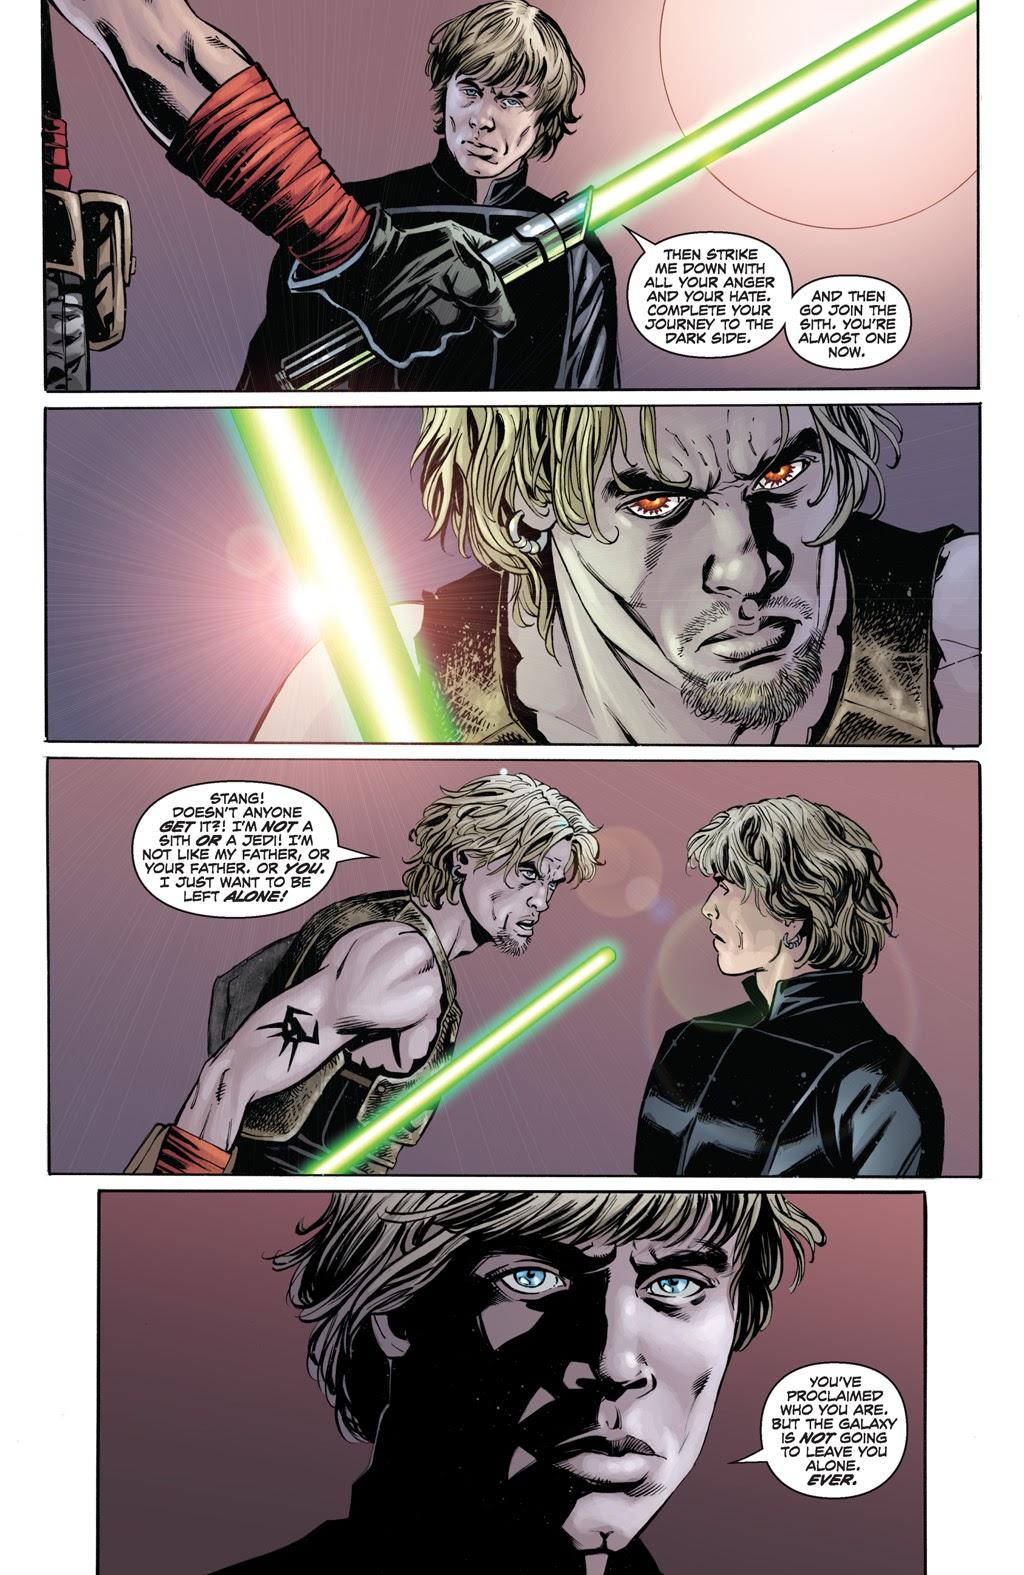 Cade Skywalker VS Luke Skywalker